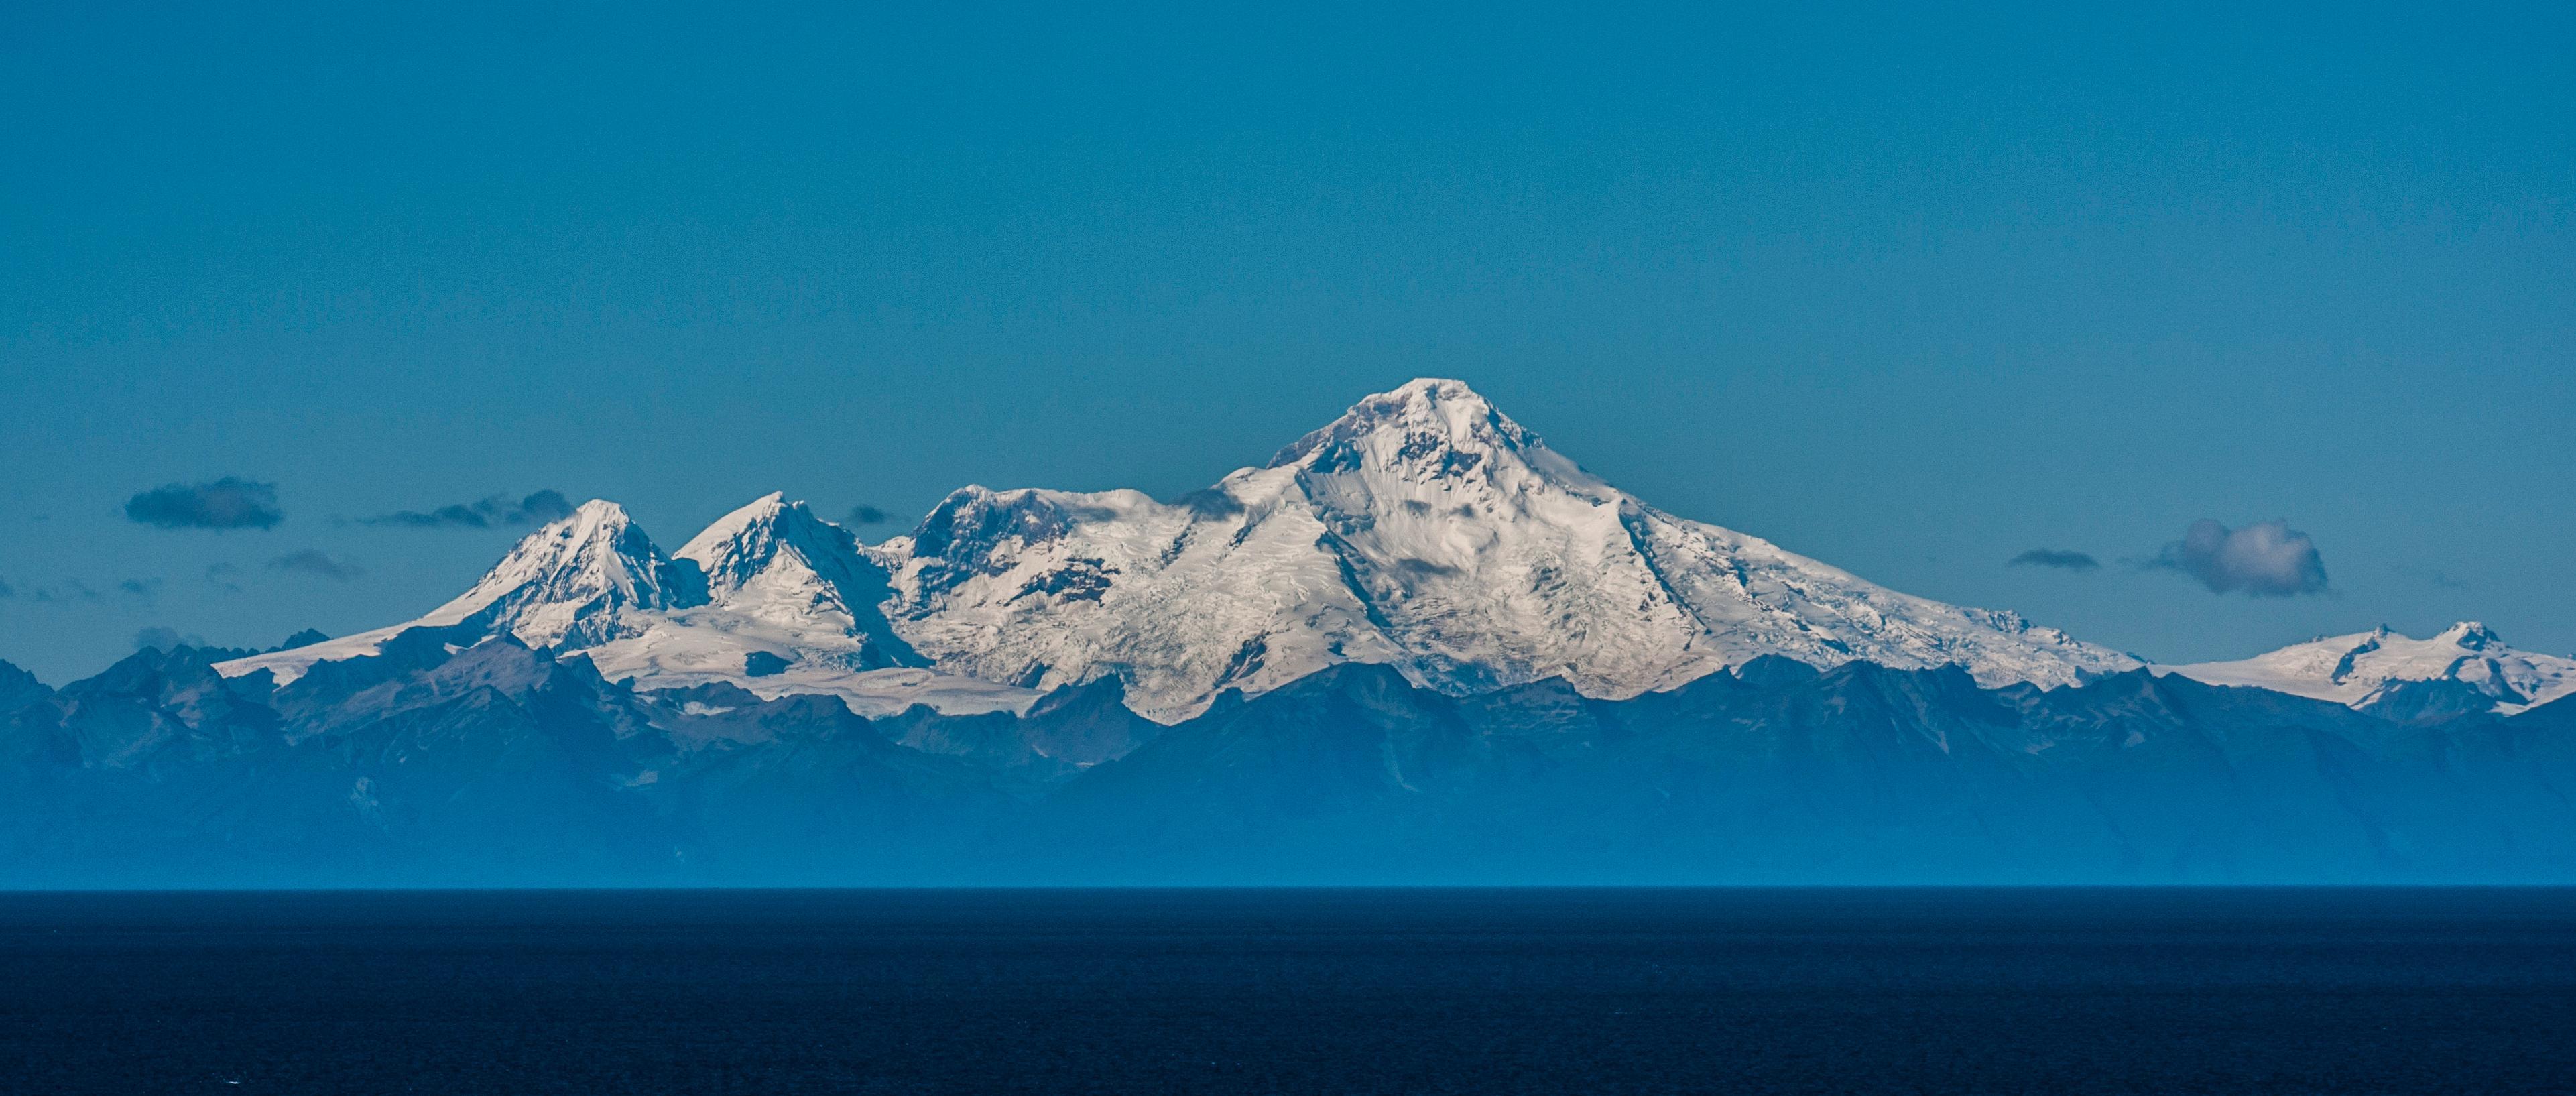 Mt. Iliamna, Alaska. Et stort fjell til en stor print.Foto: Kristoffer Møllevik